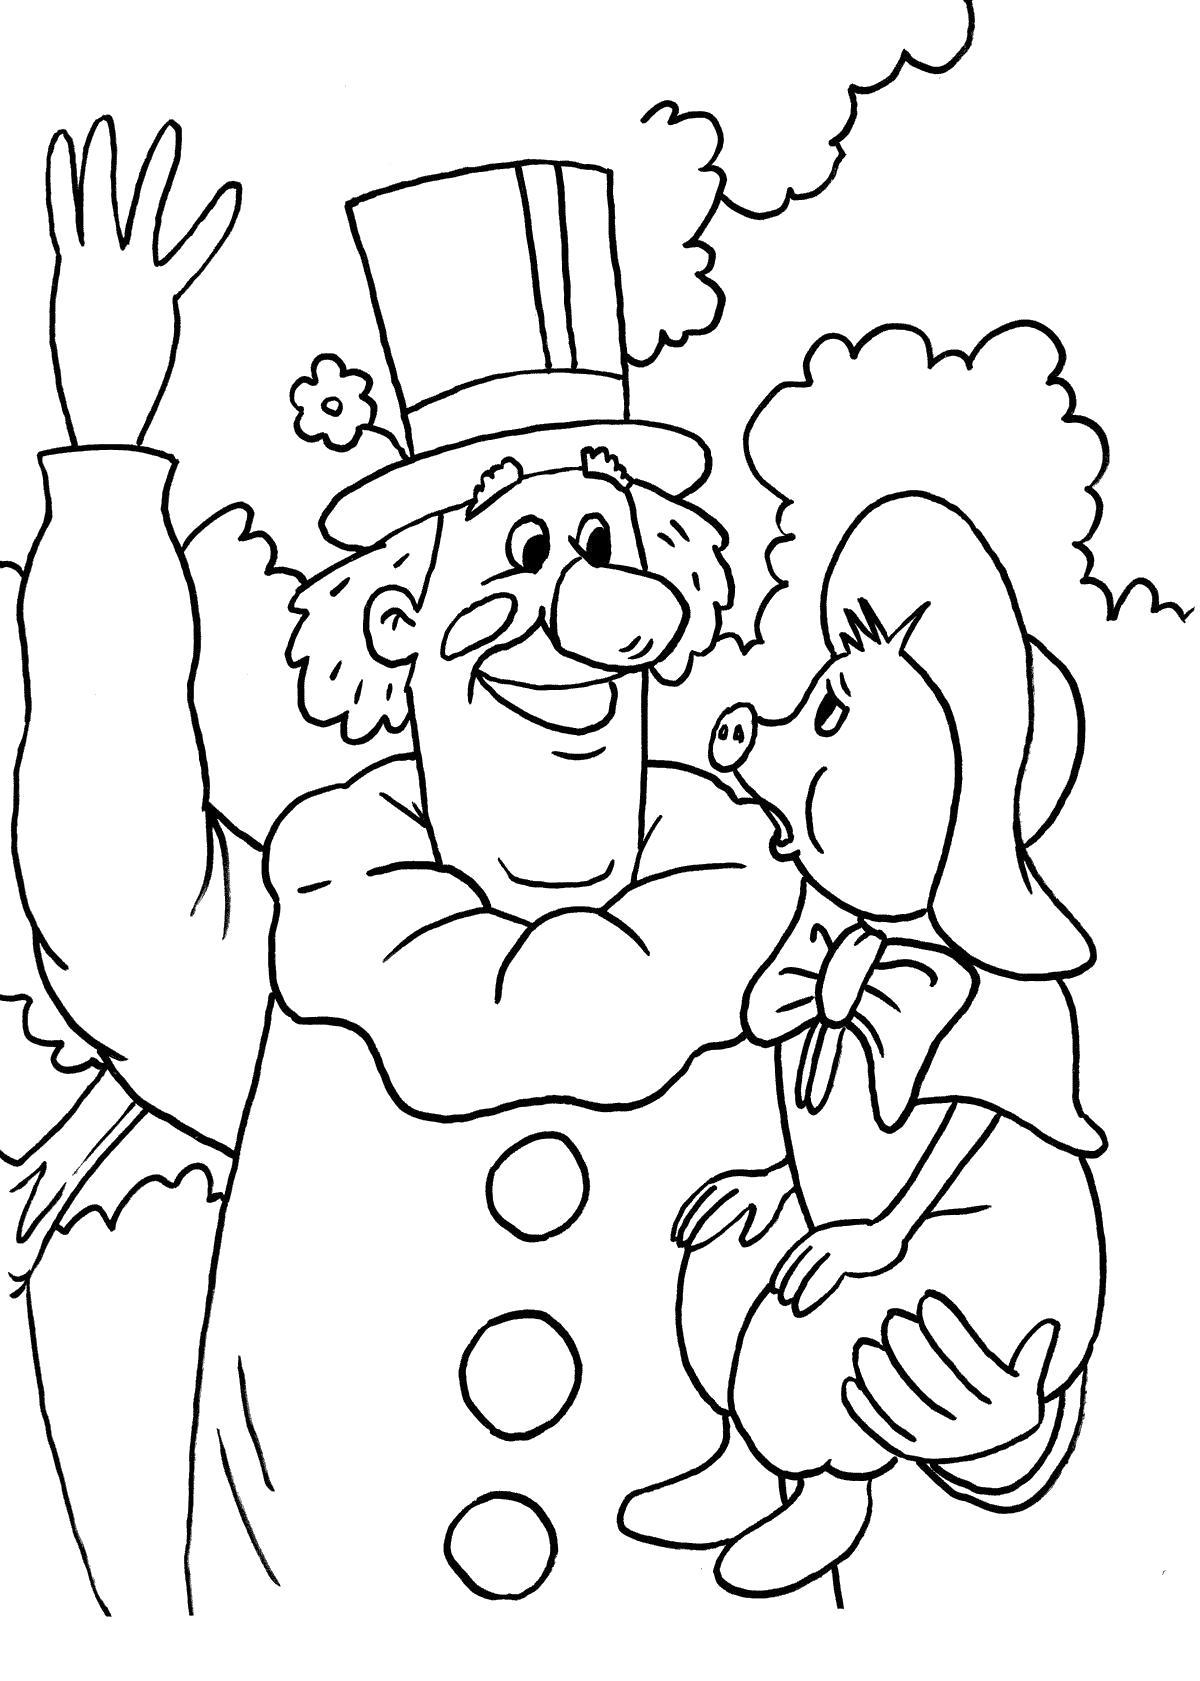 Раскраска Клоун и Фунтик. Скачать клоун.  Распечатать клоун